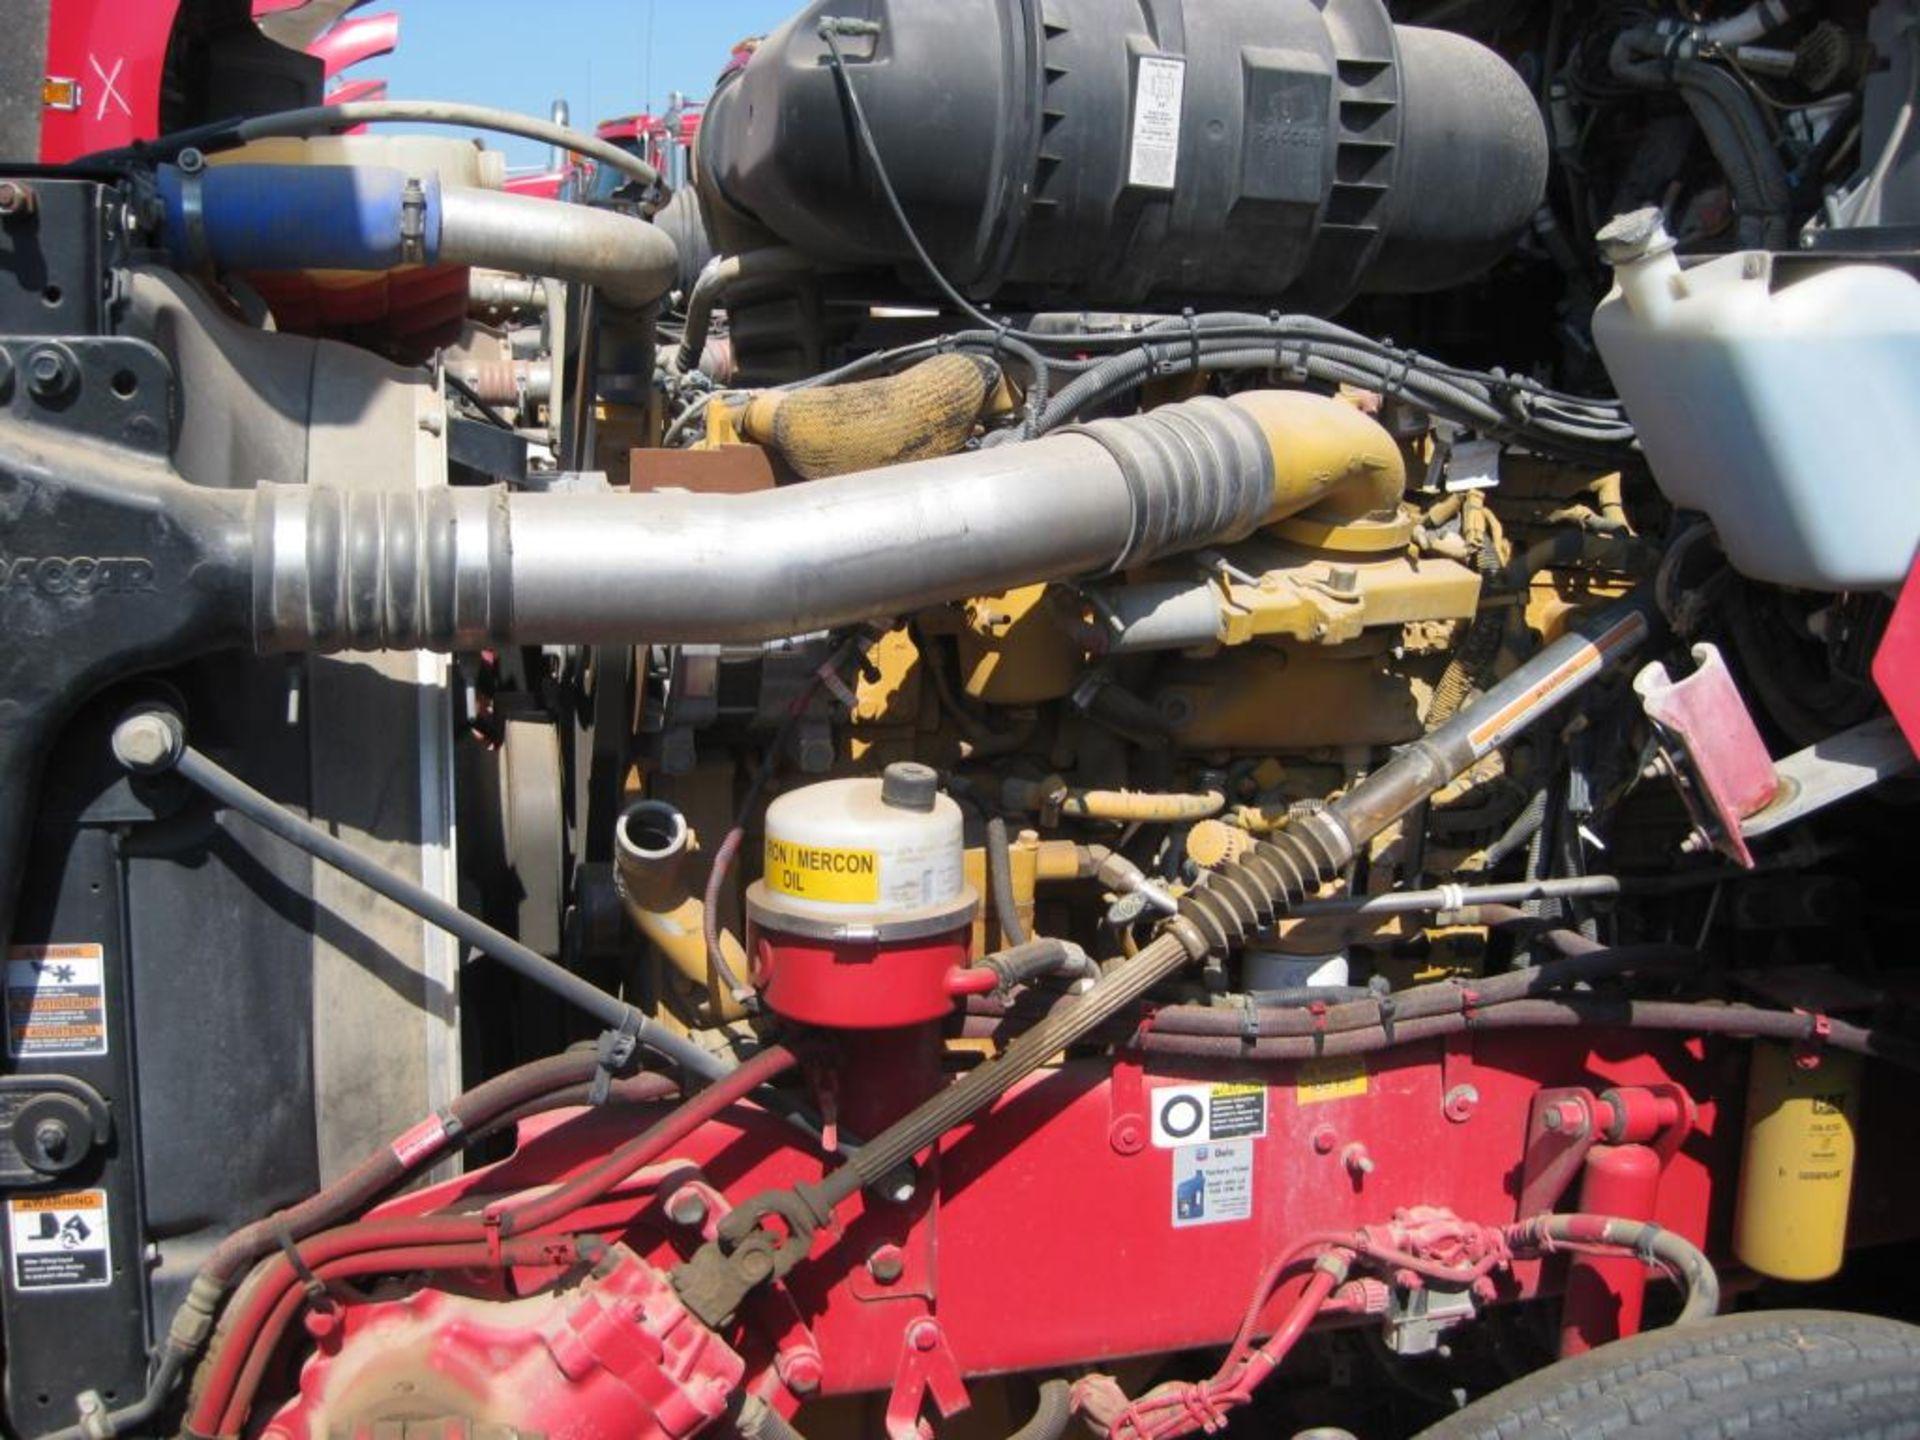 Kenworth Truck - Image 21 of 22